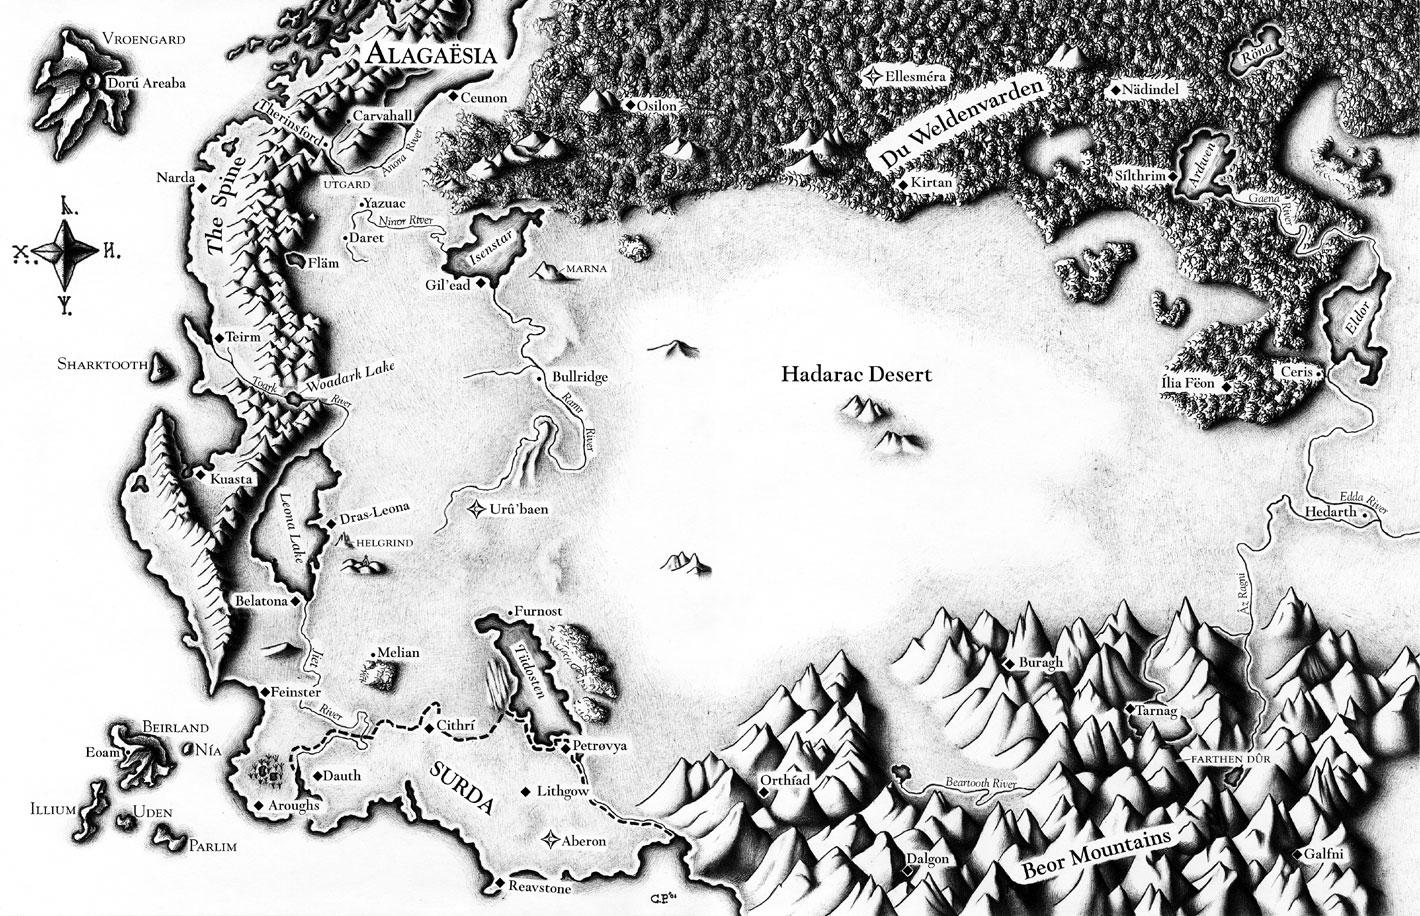 The Map of Alagaësia